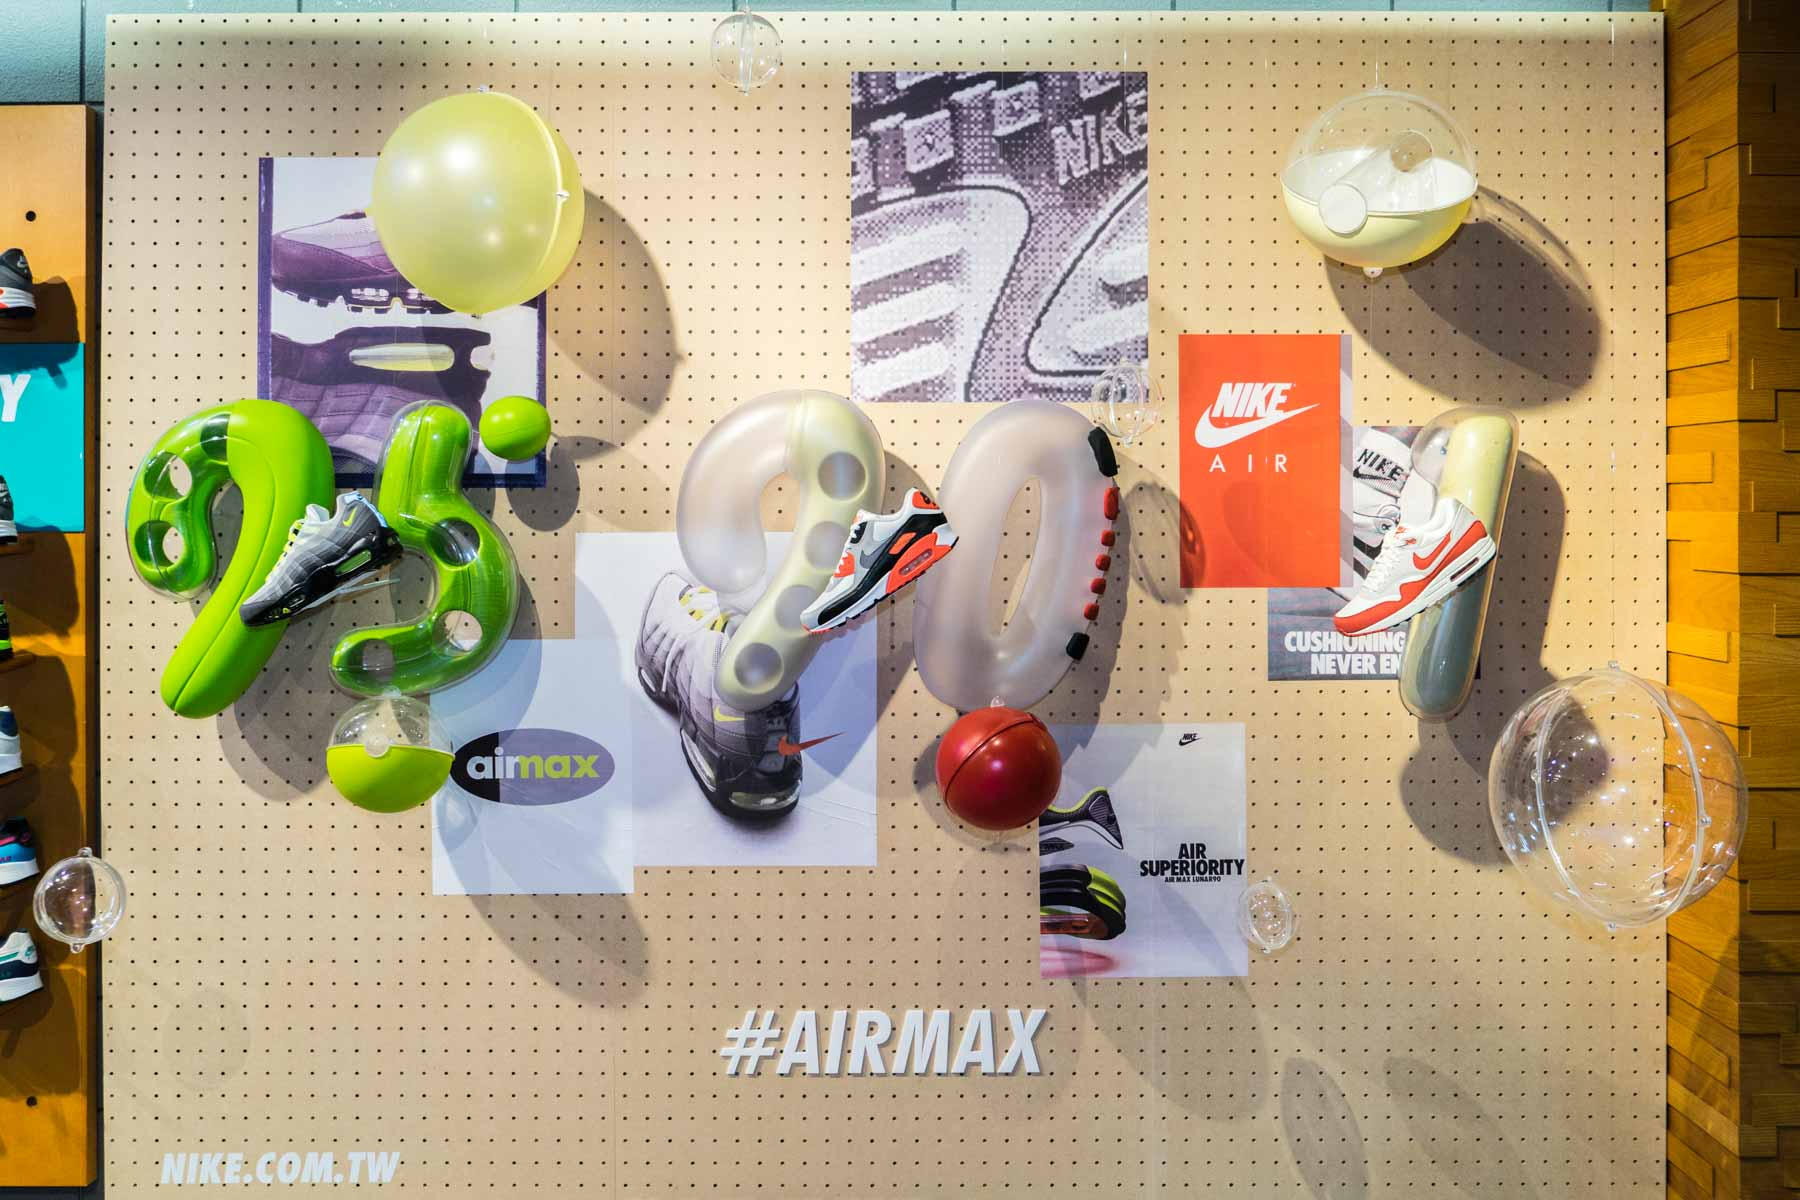 Nike Air Max Day 2015